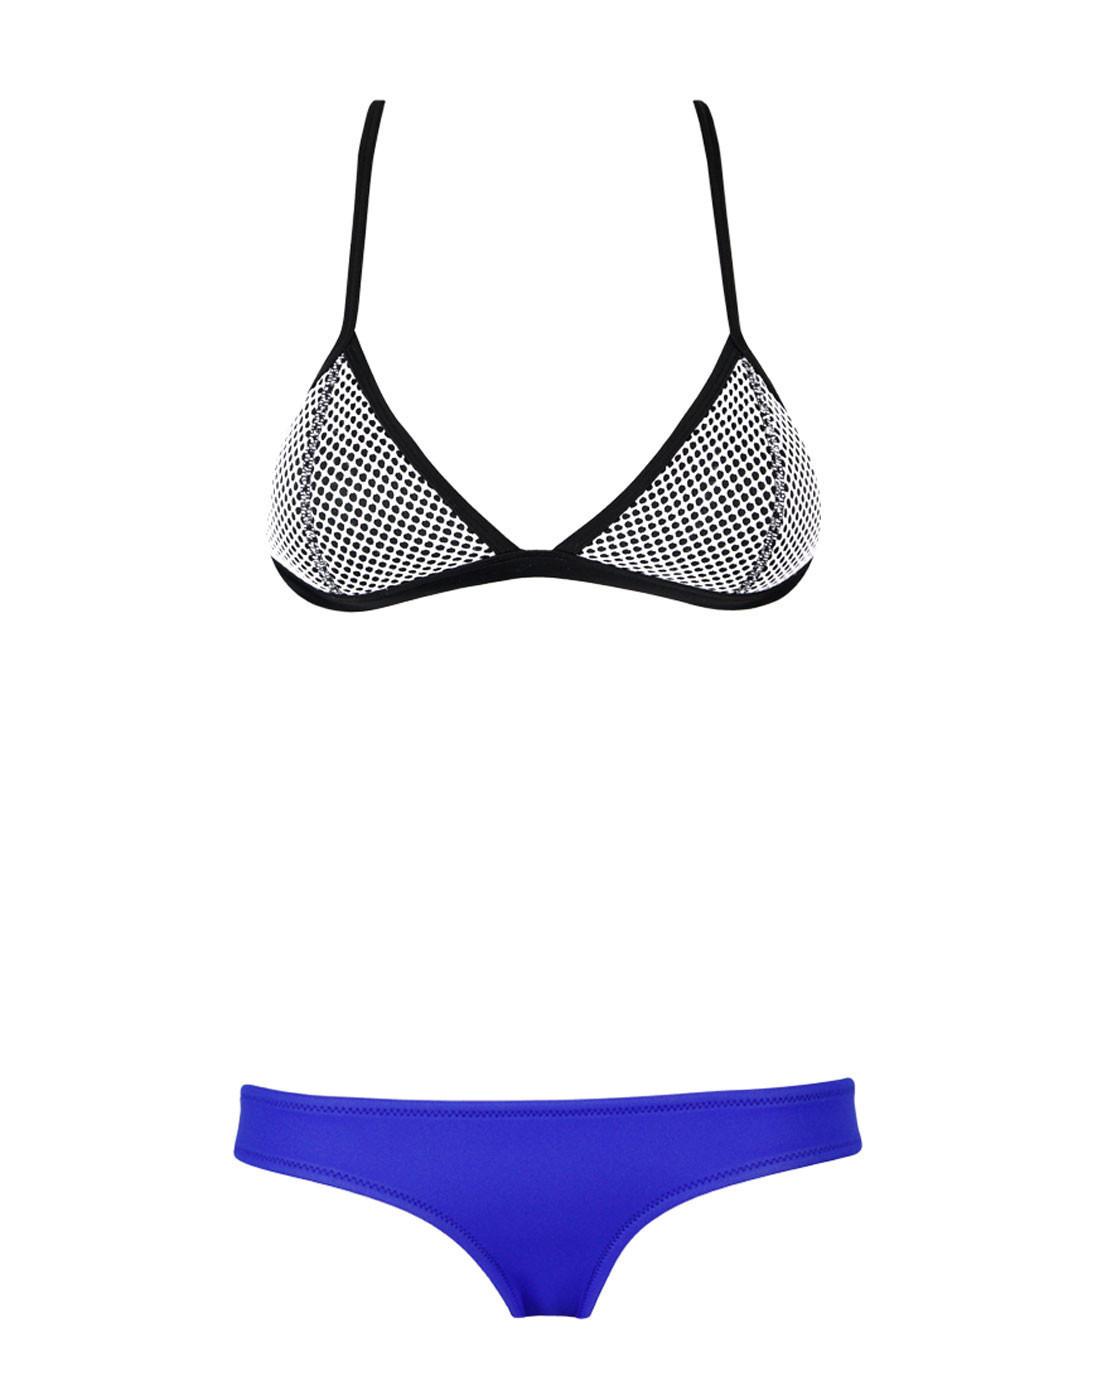 9930b55d4 ShopandBox - Buy Triangl Bikini from AU